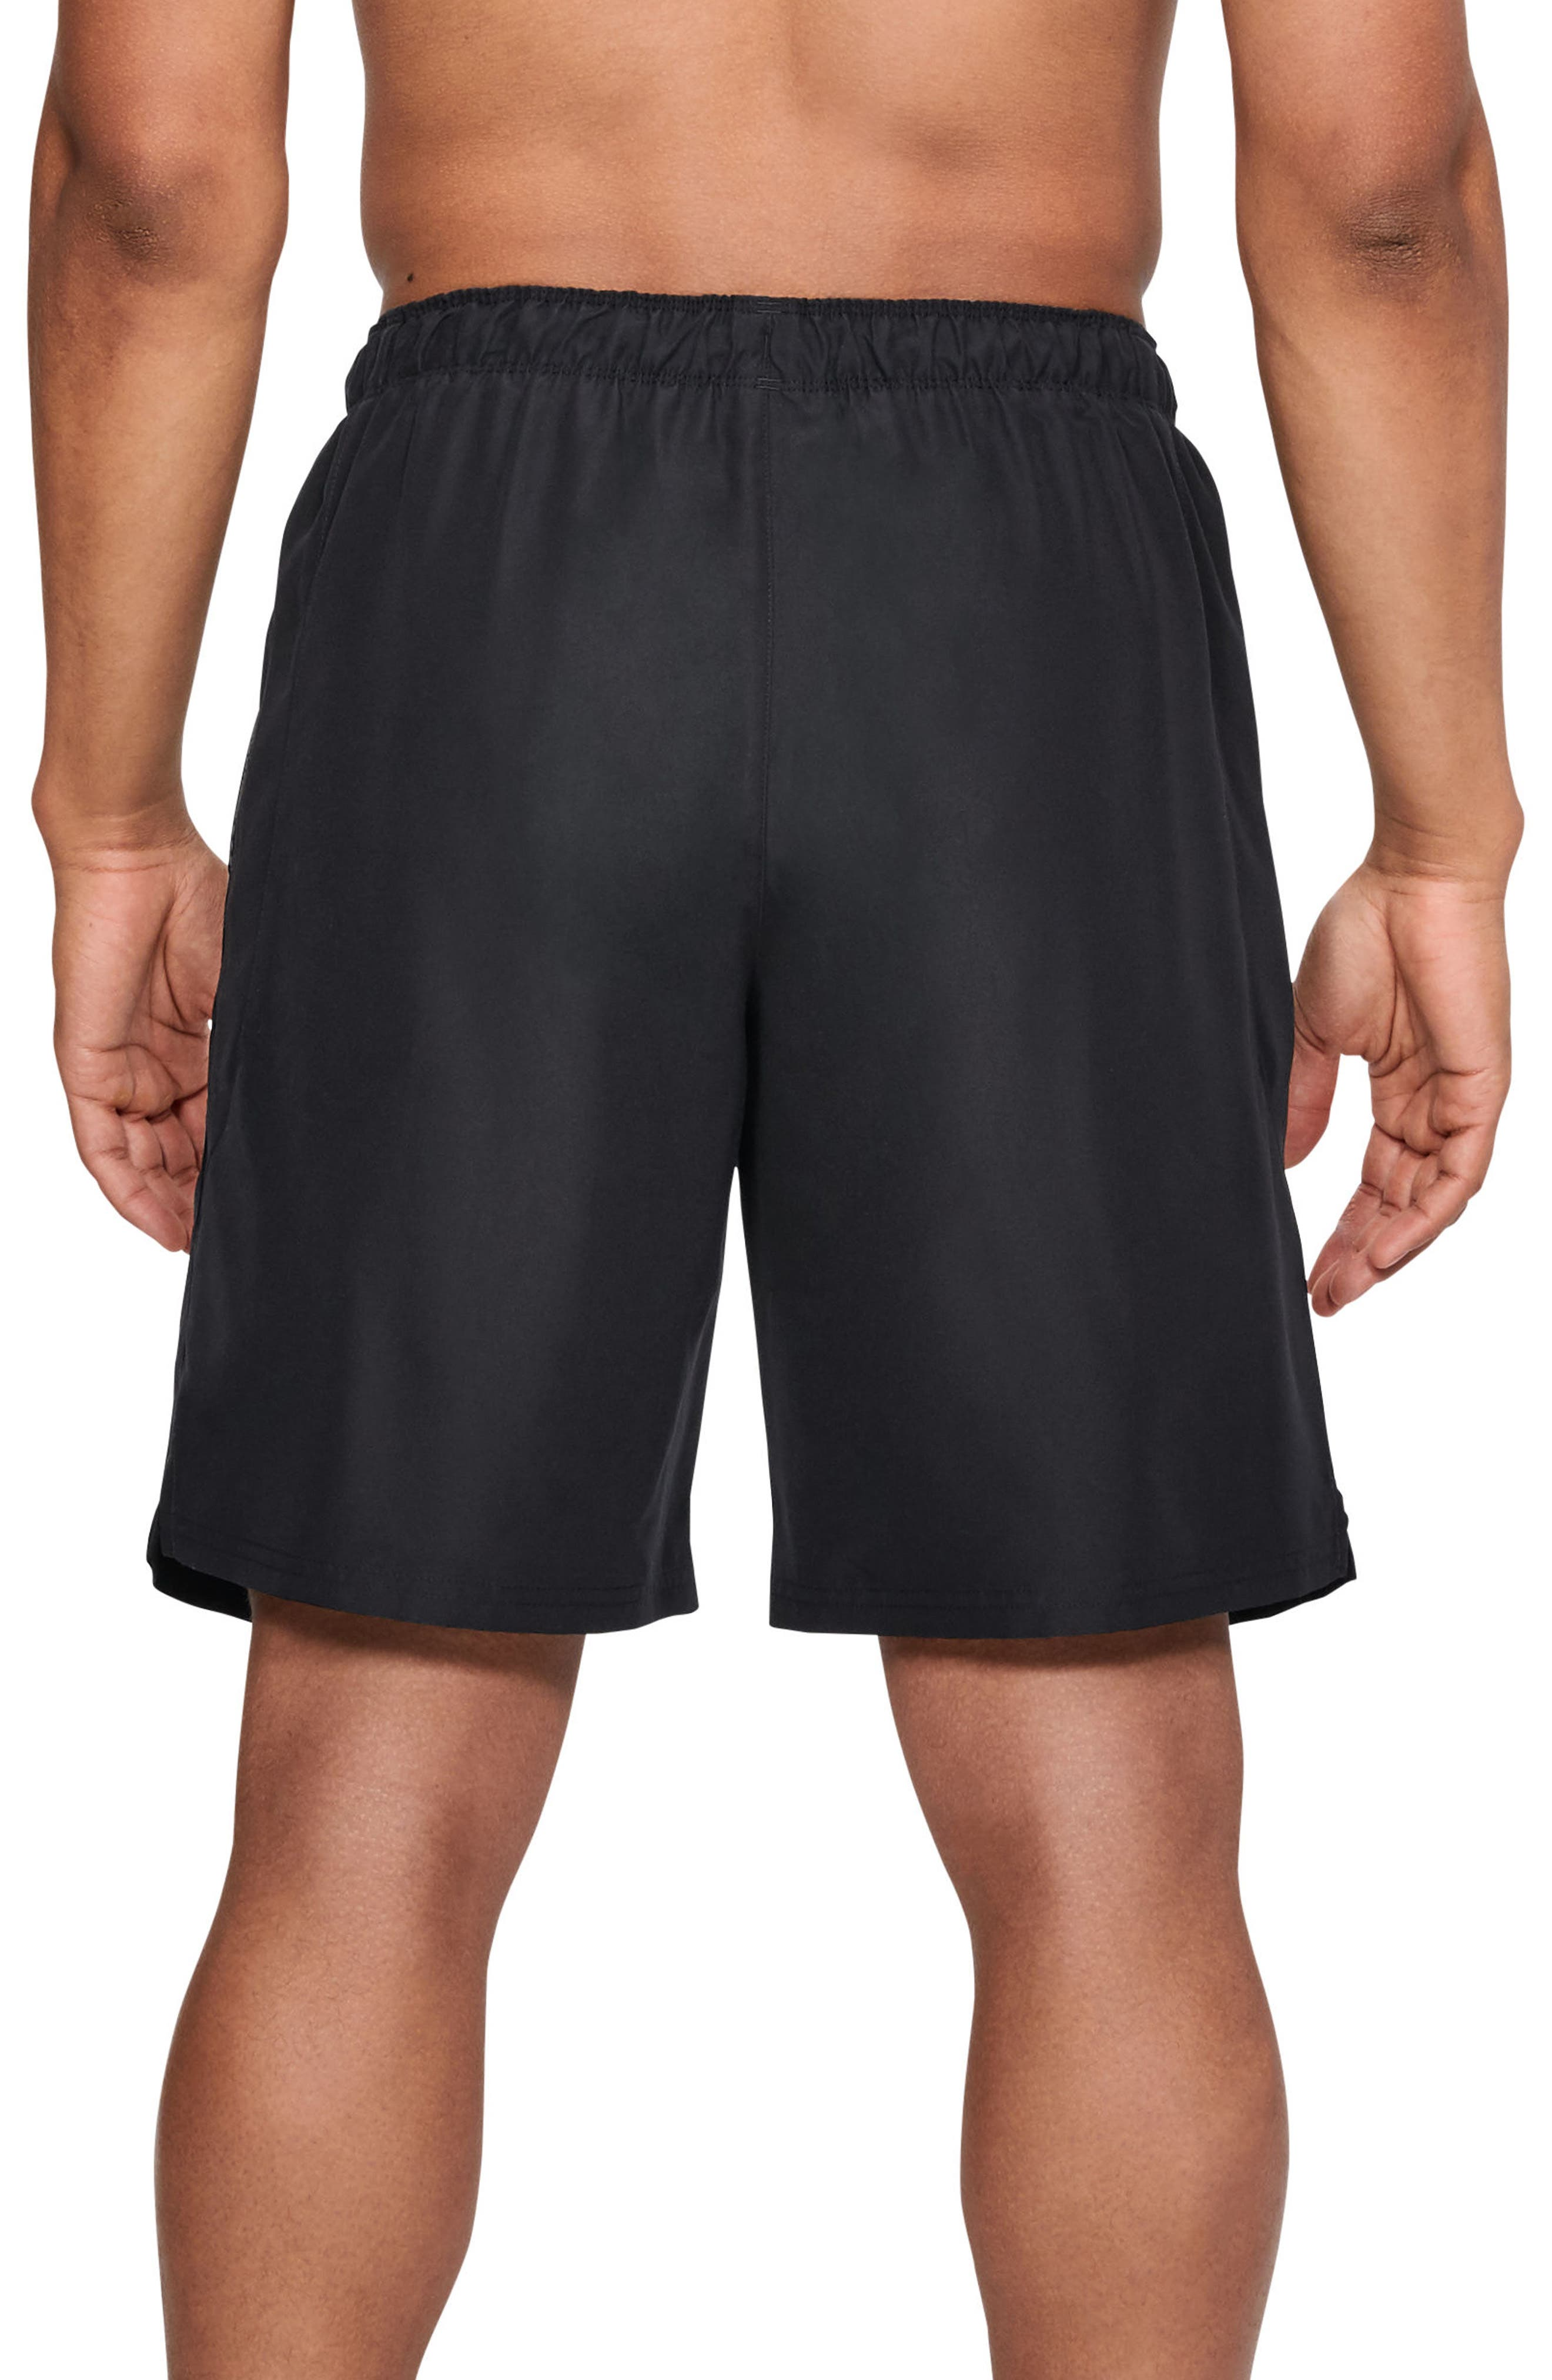 Mania Athletic Shorts,                             Alternate thumbnail 2, color,                             001